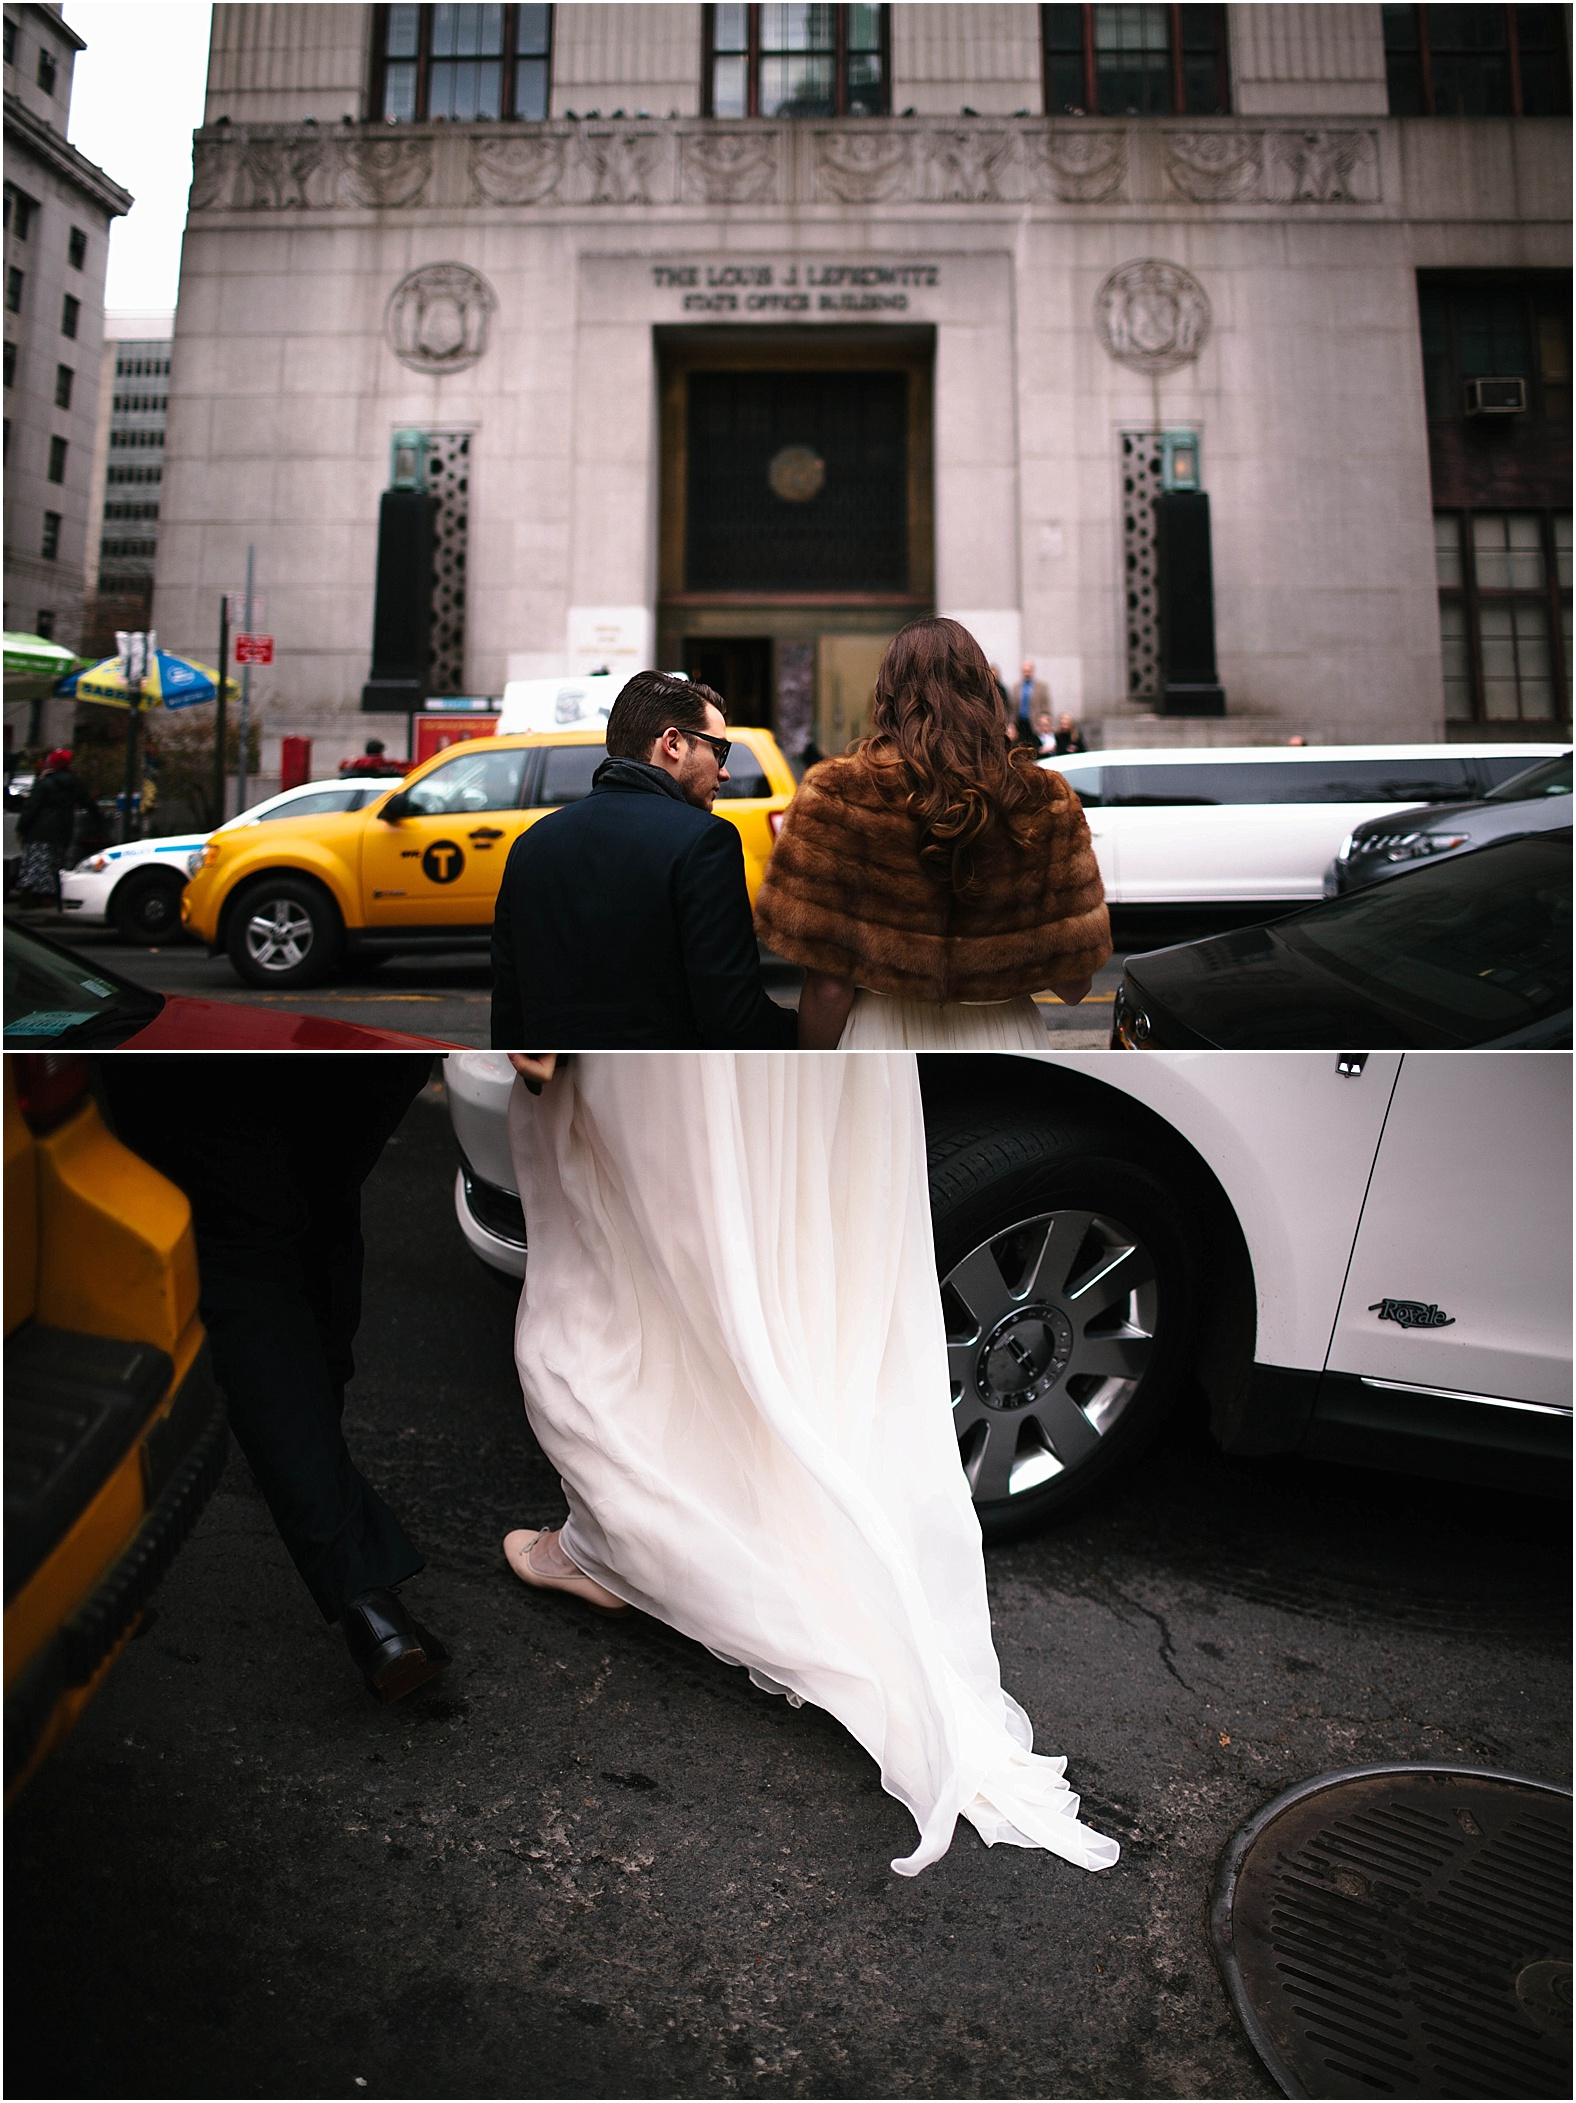 manzanita photo by rebecca caridad internation wedding photogrpaher, colorado wedding photographer, nashville wedding photographer_0610.jpg